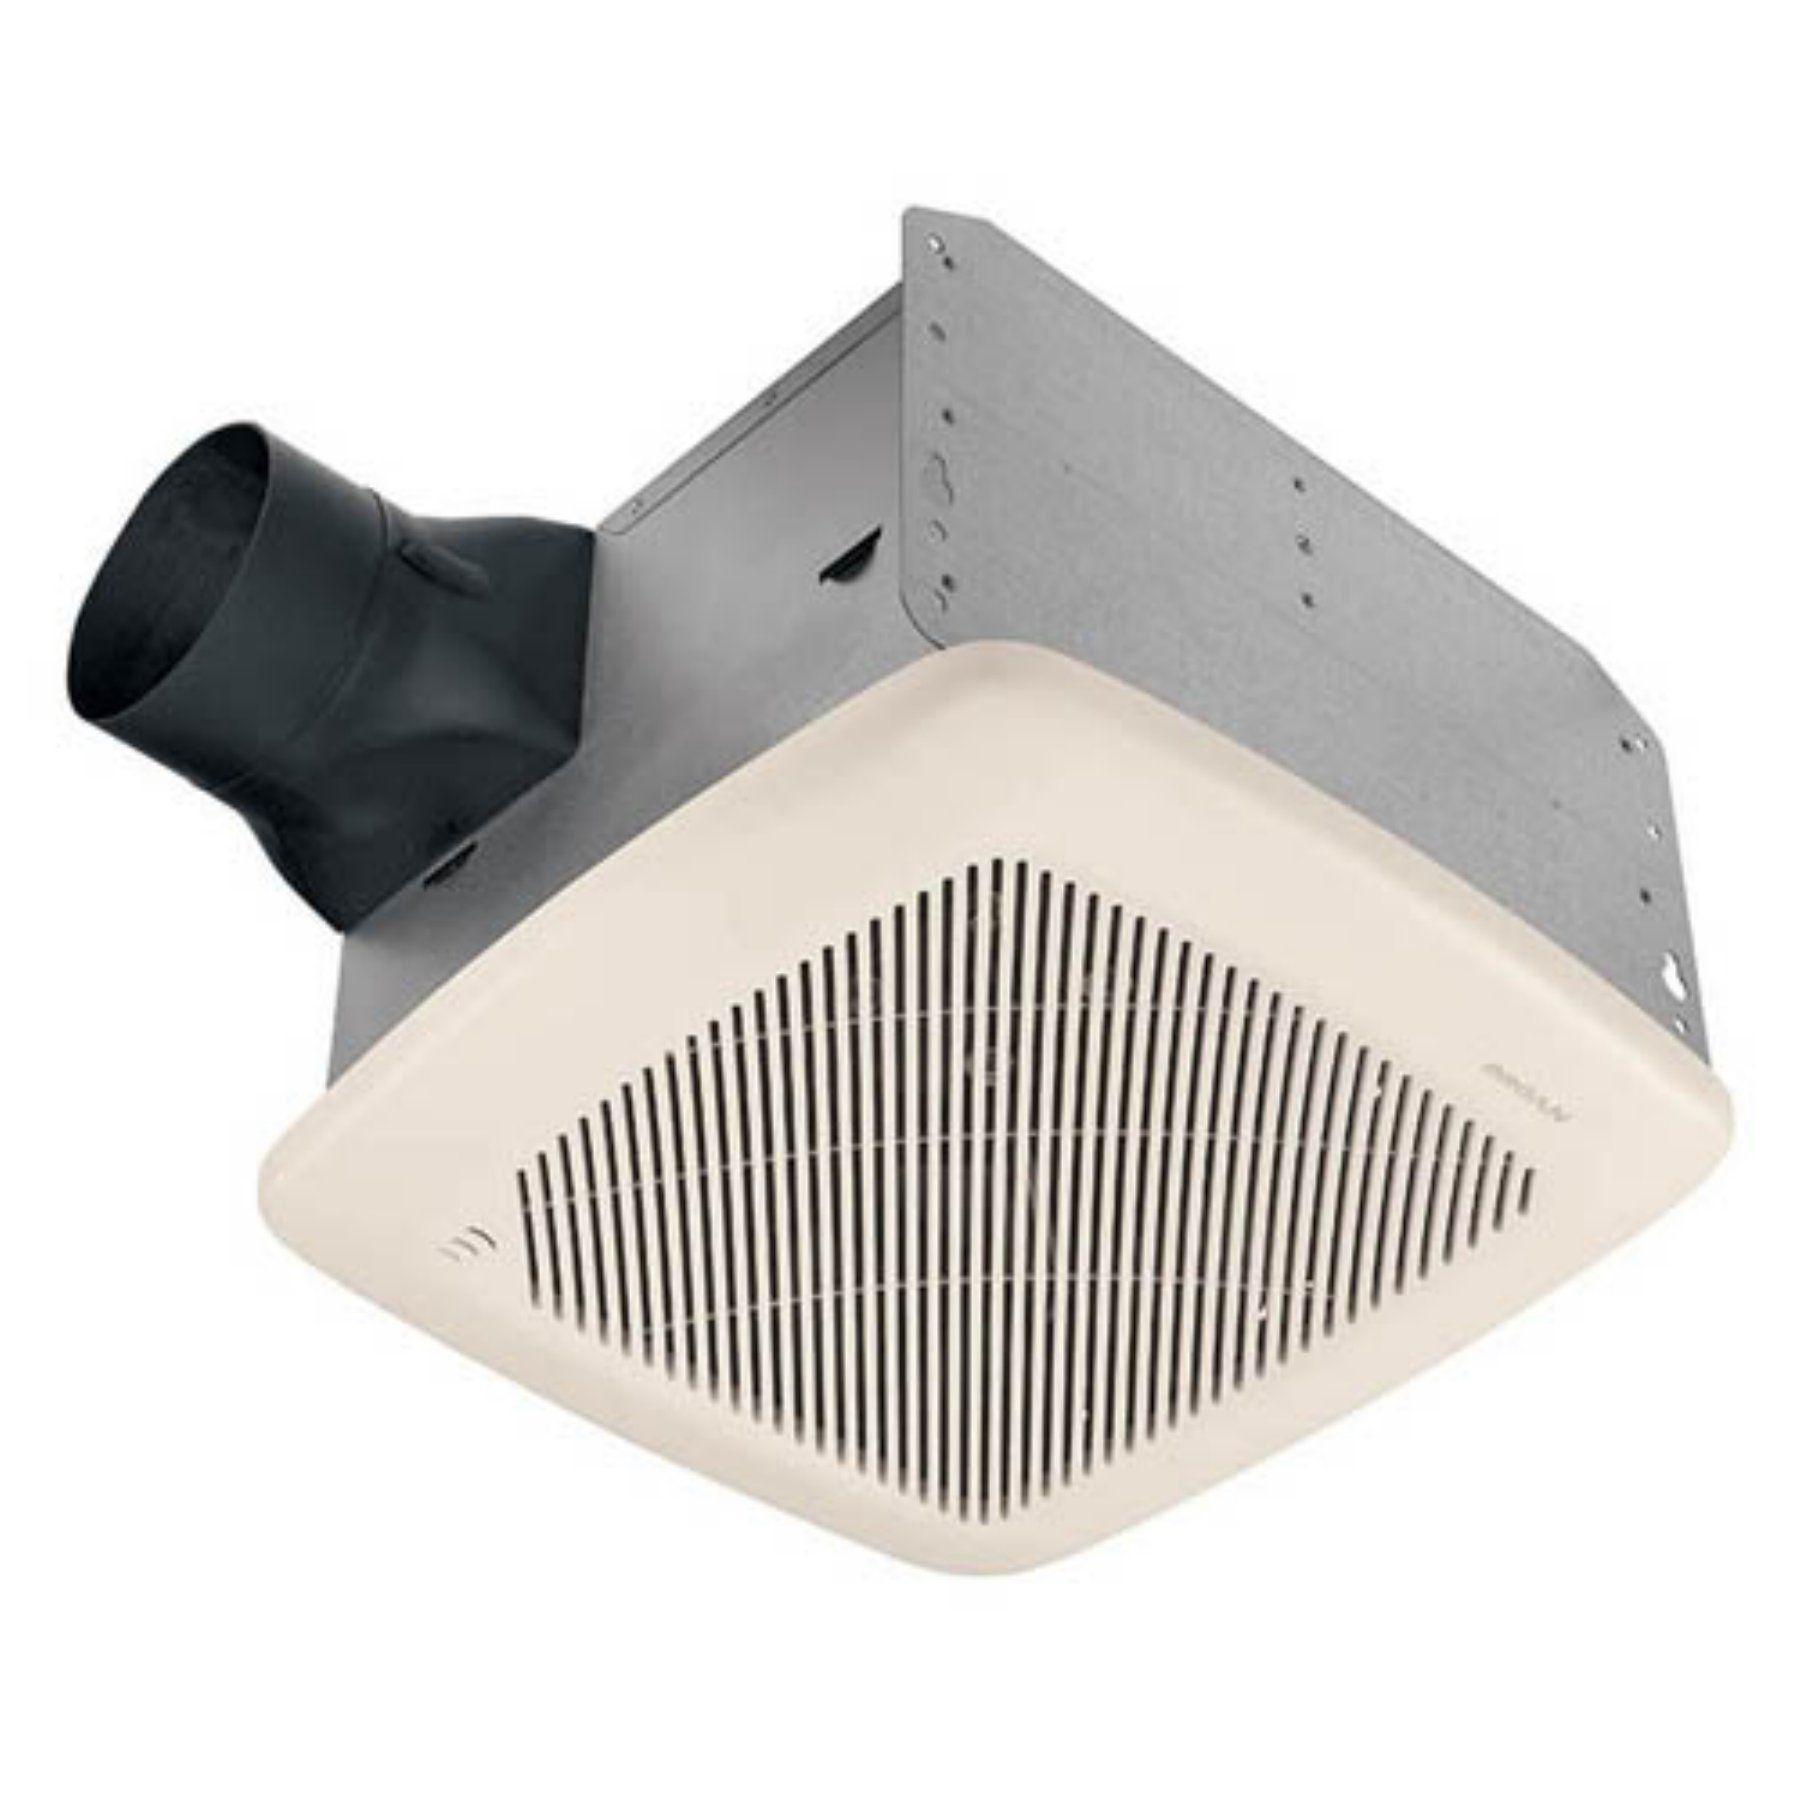 Broan-Nutone QTRE100S Ultra Silent Humidity Sensing